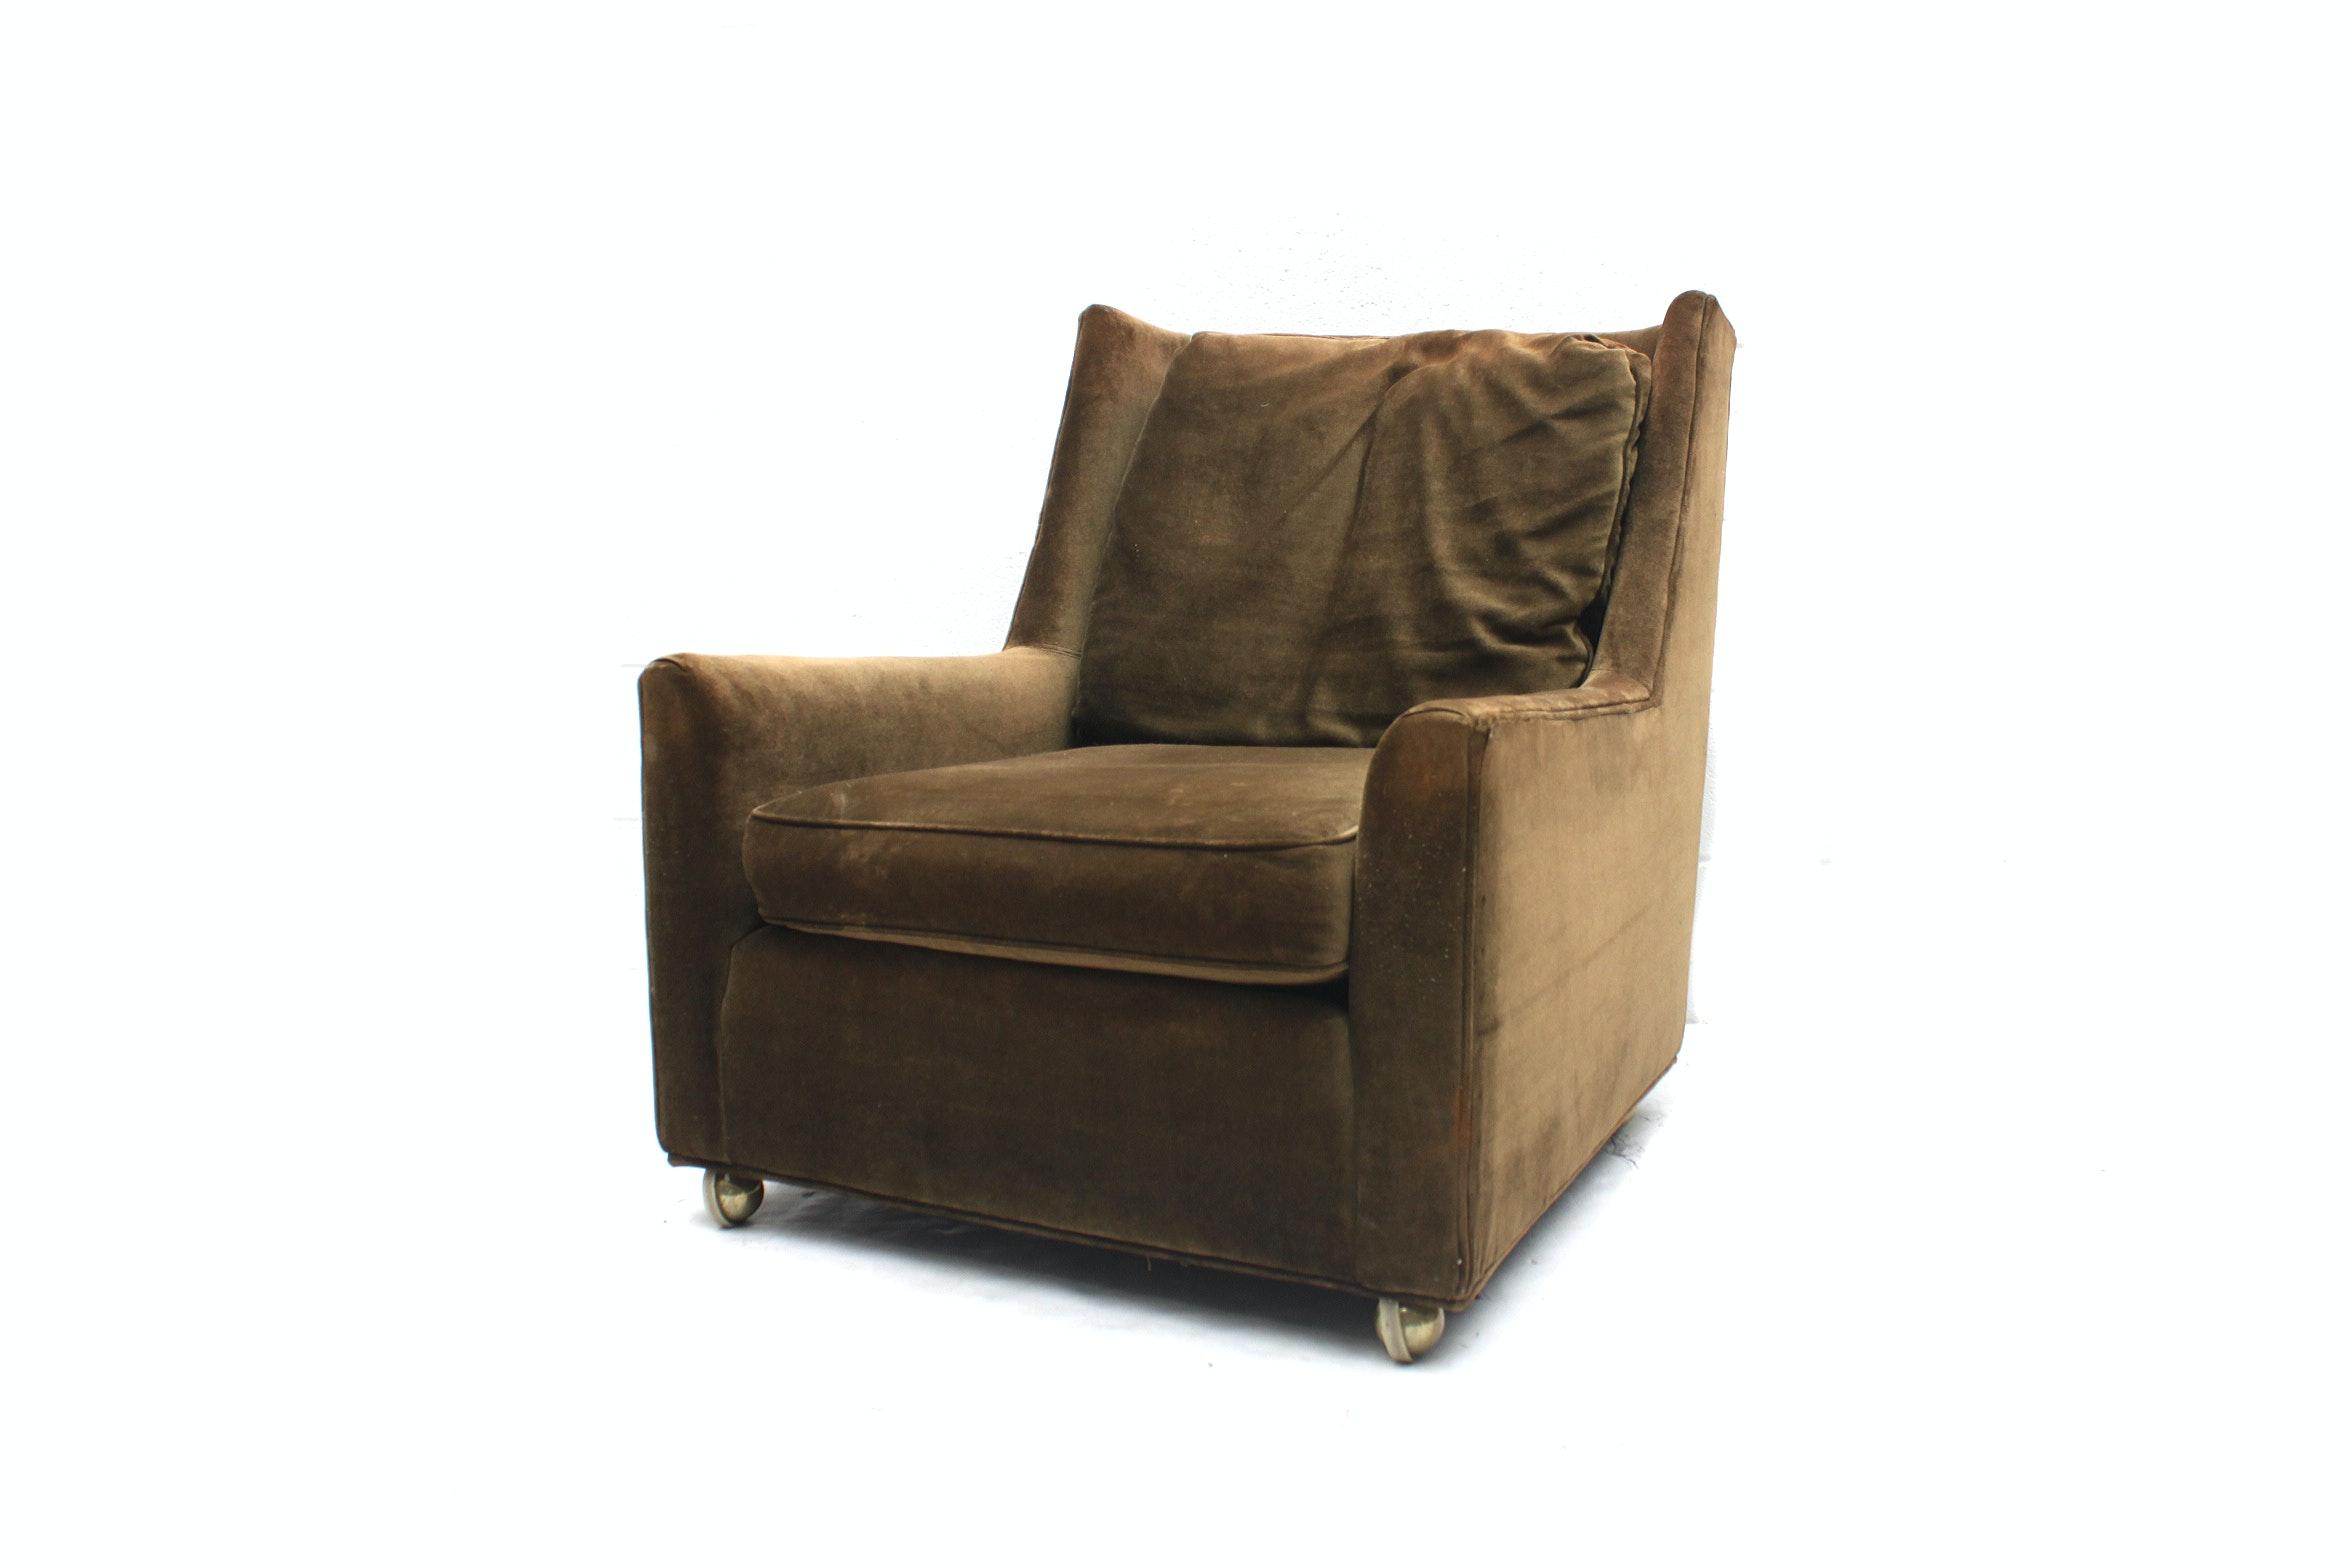 Vintage Green Velour Armchair Made for Carson Pirie Scott & Co.